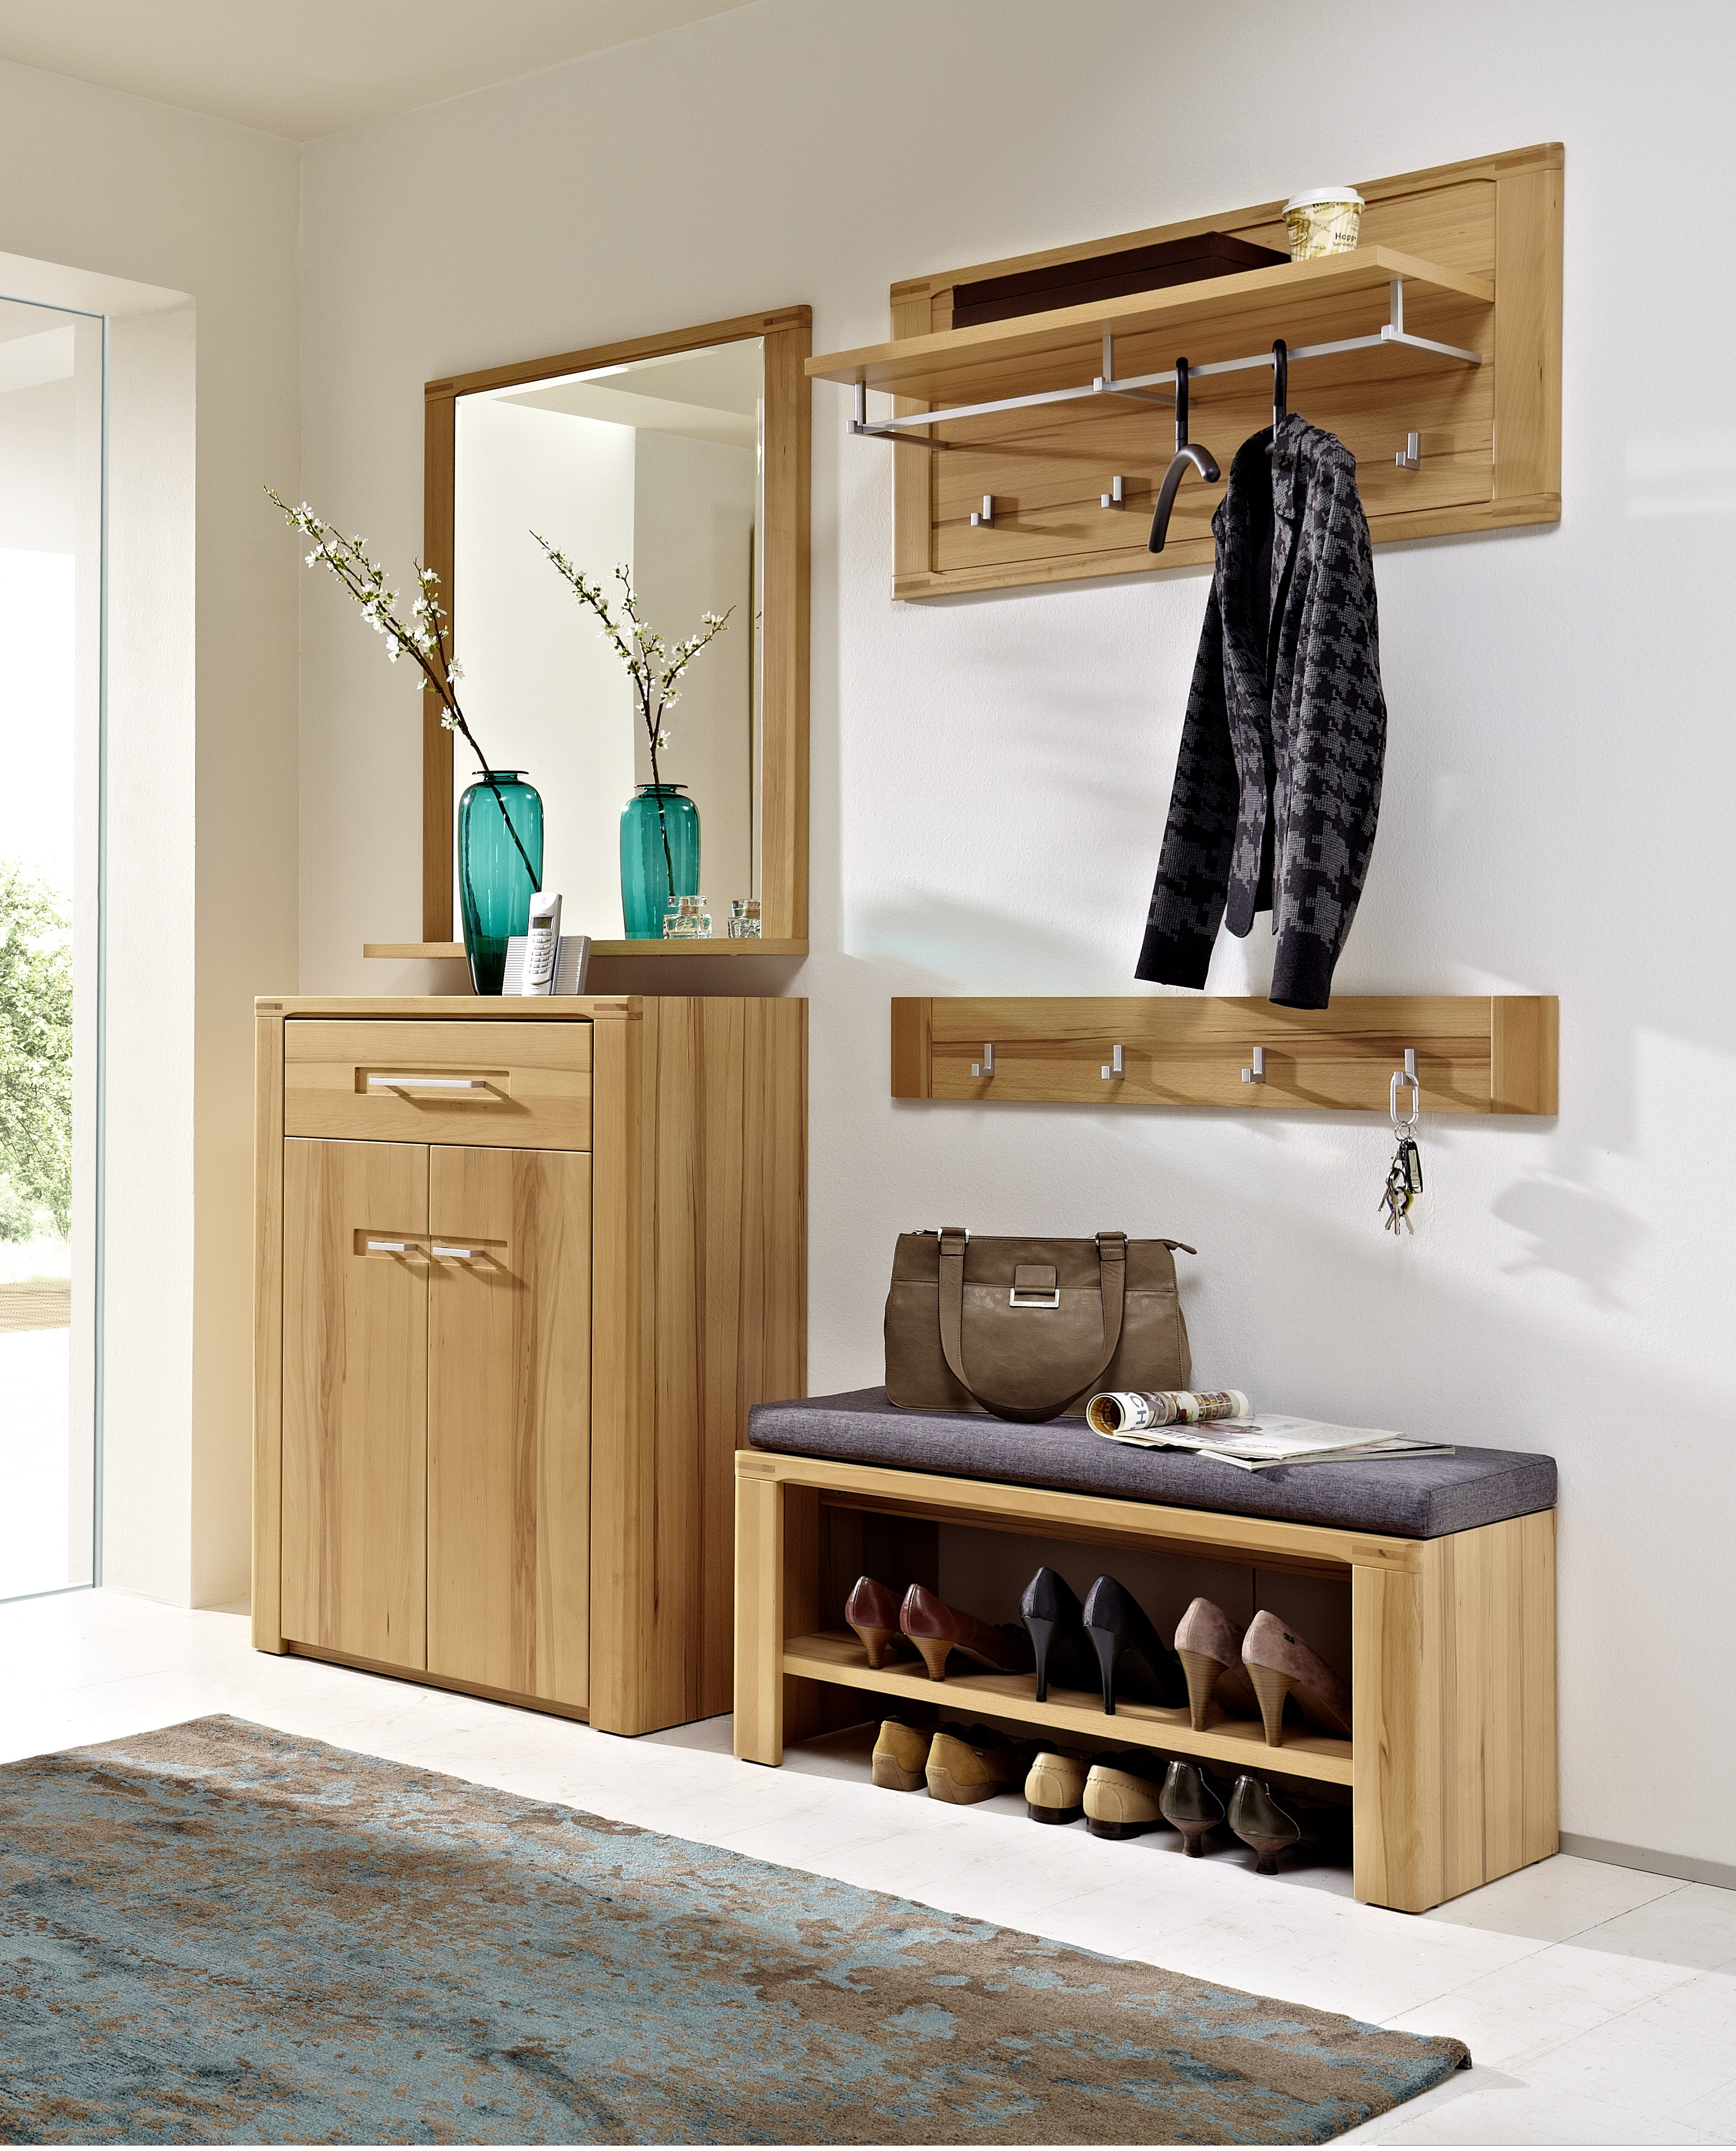 nestor plus garderobenpaneel. Black Bedroom Furniture Sets. Home Design Ideas